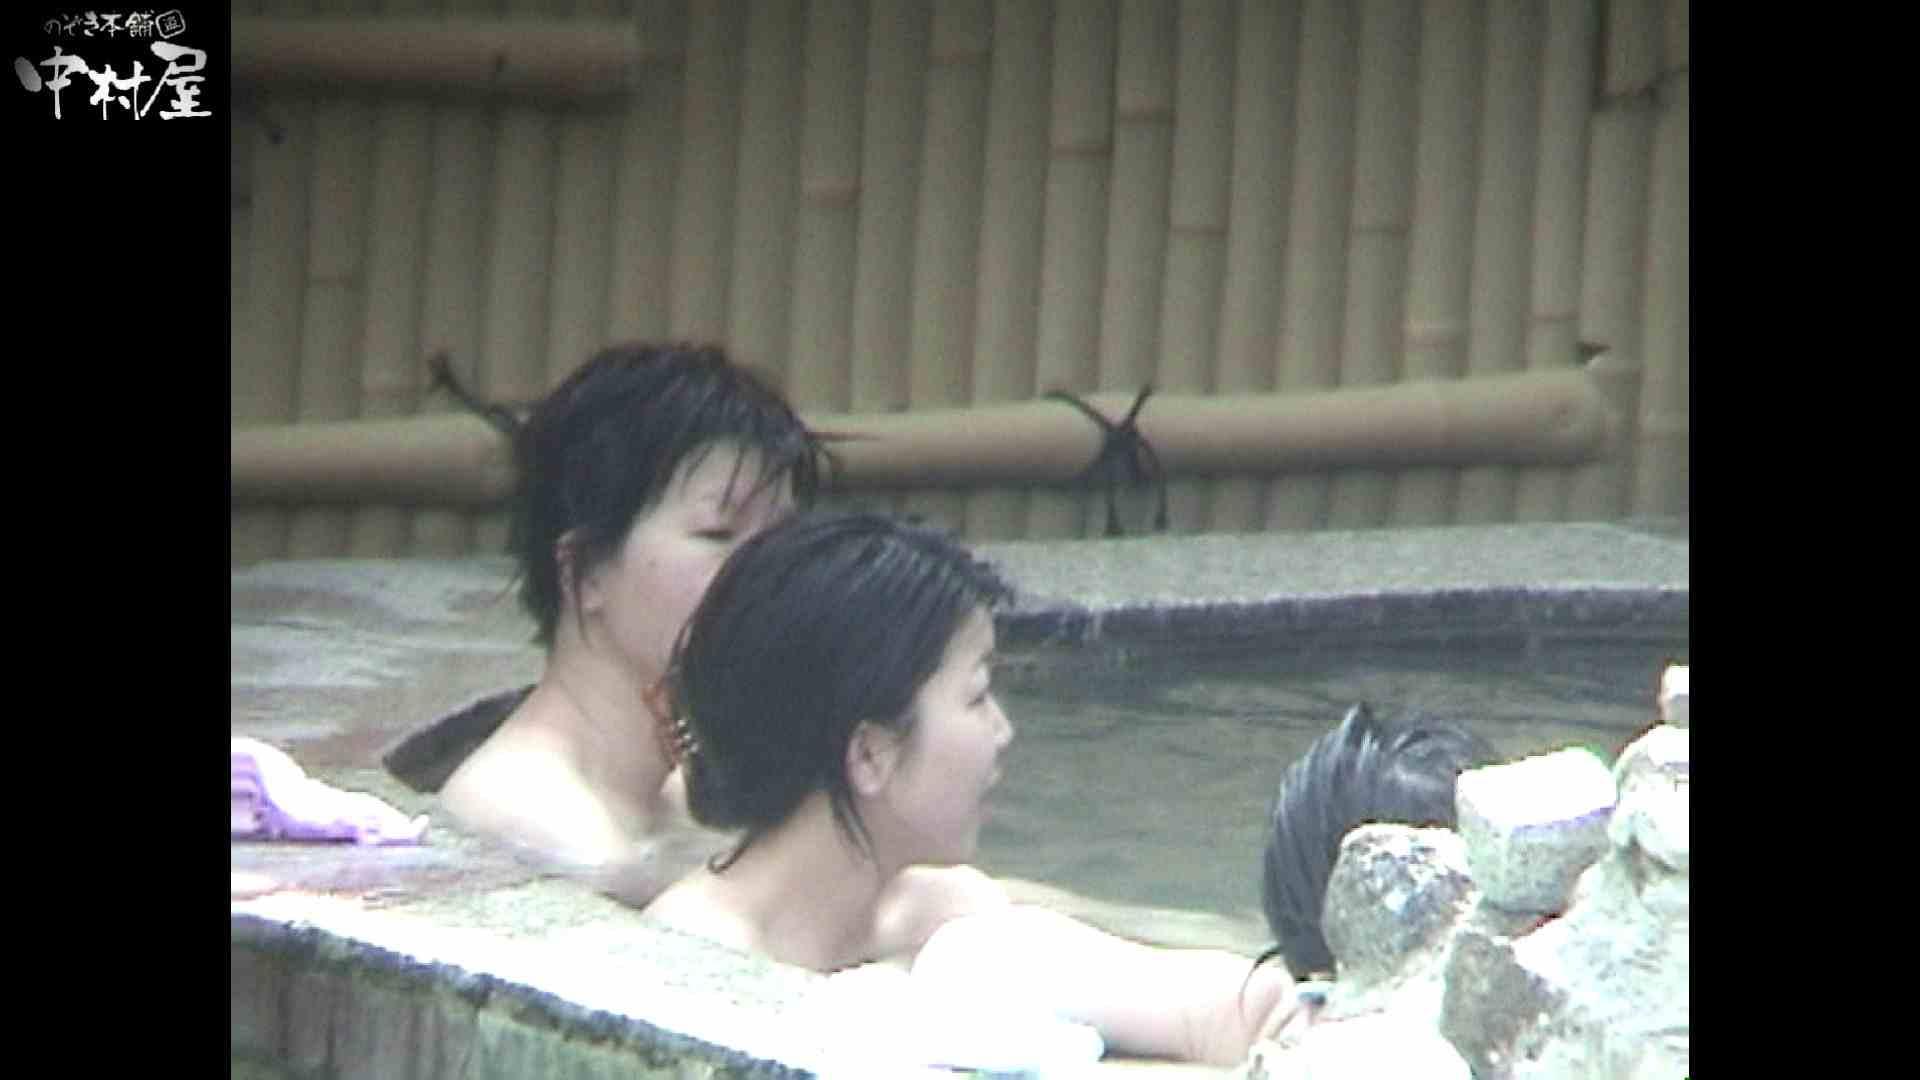 Aquaな露天風呂Vol.936 盗撮映像  110Pix 54